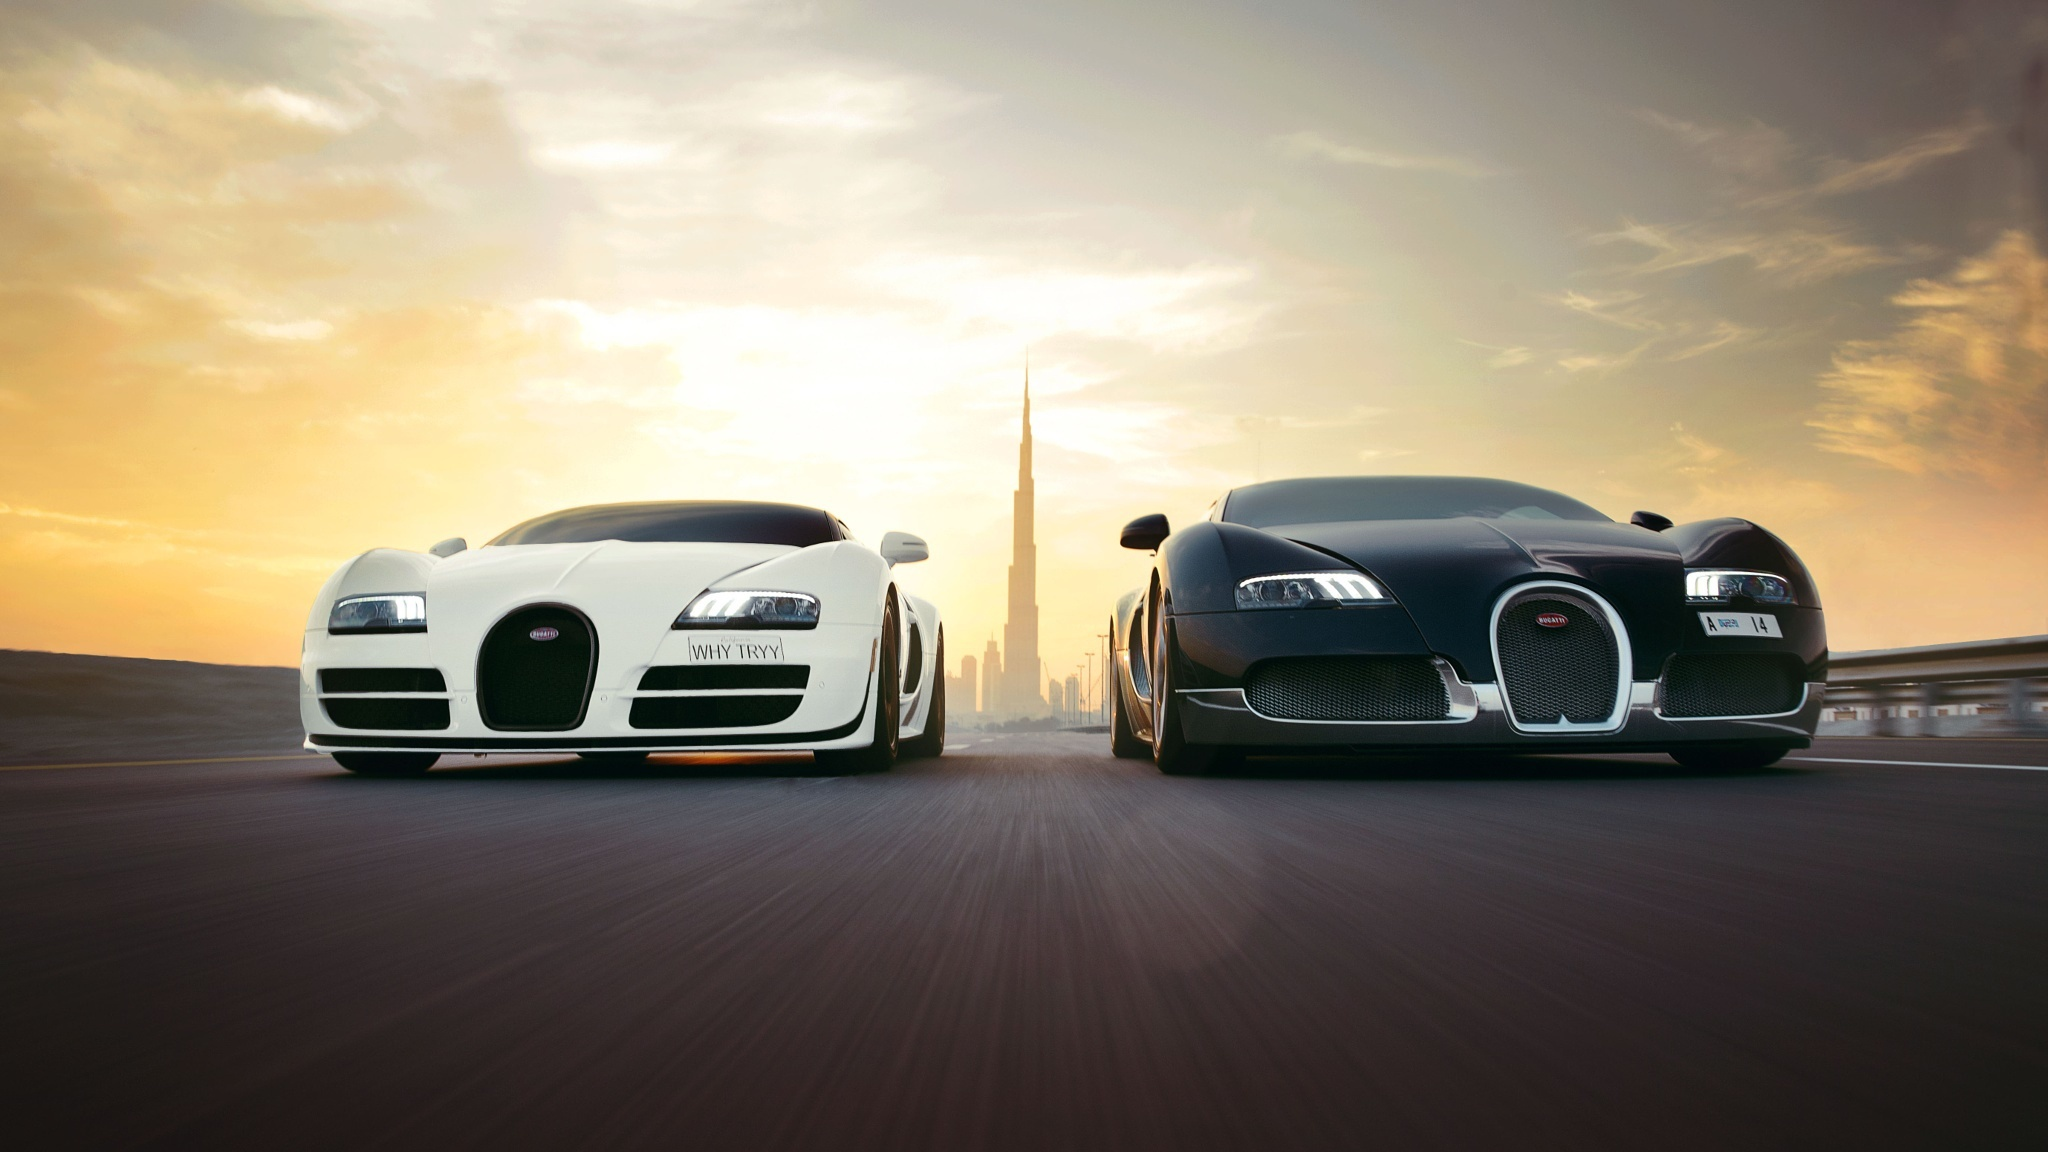 2048x1152 wallpaper,land vehicle,vehicle,car,sports car,bugatti veyron